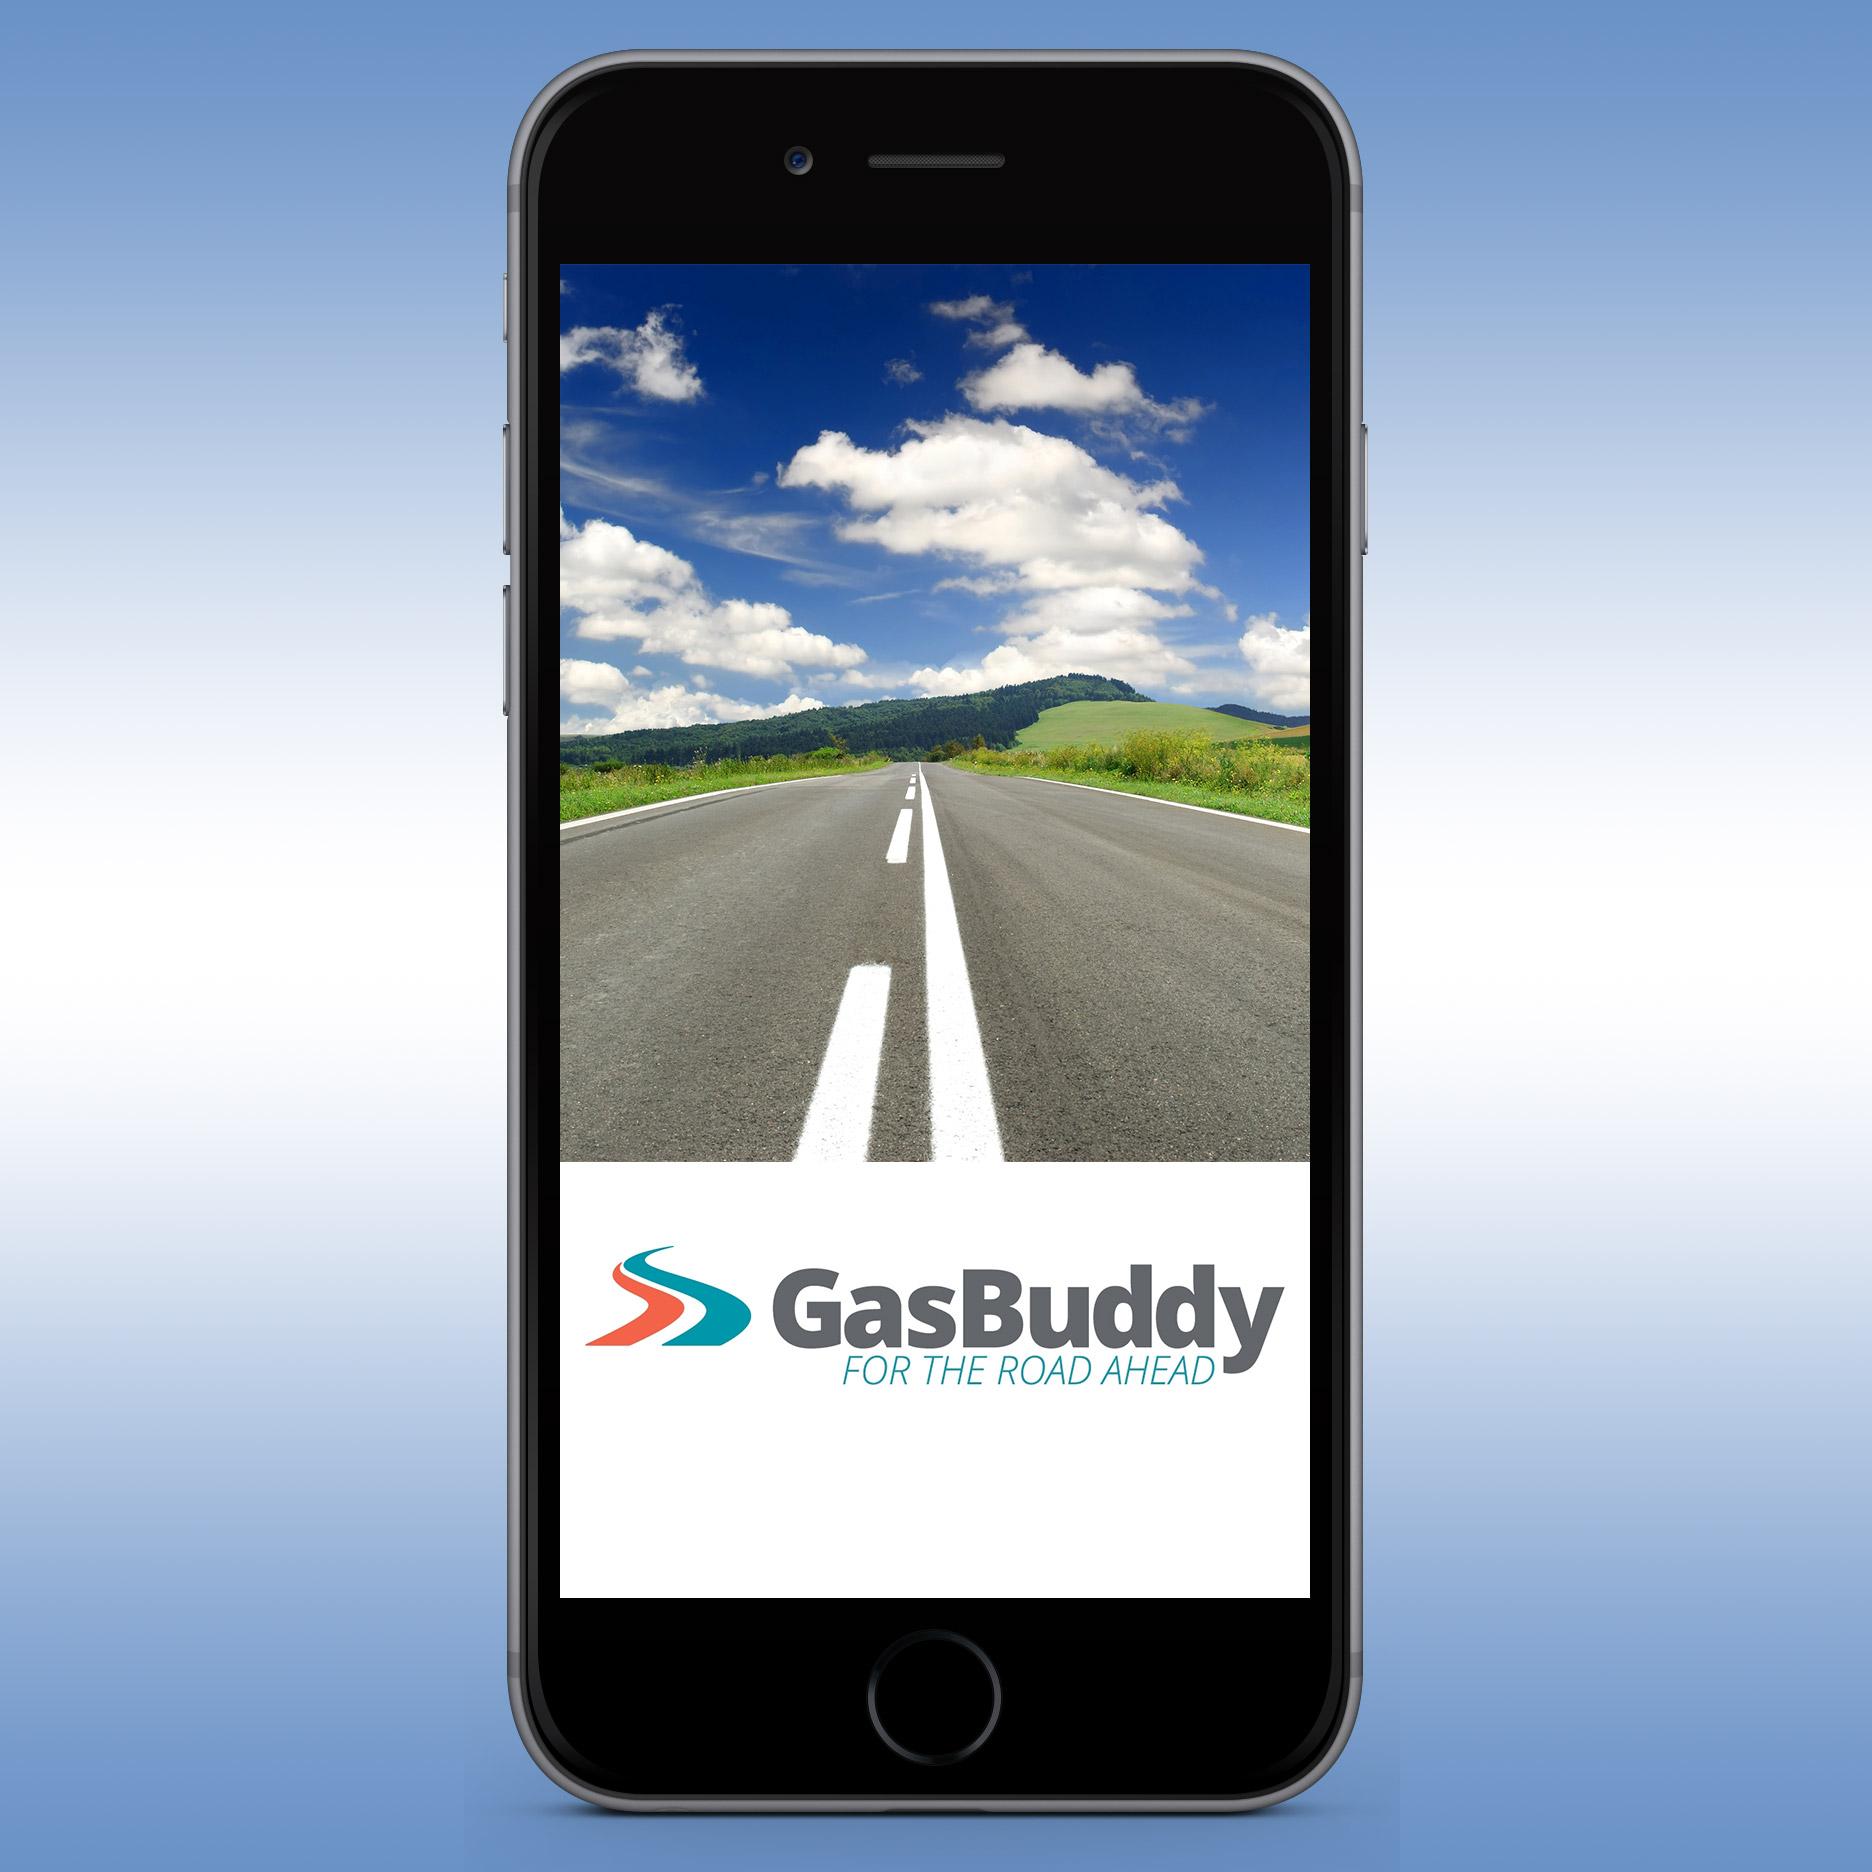 gasbuddy-thumbnnail.jpg